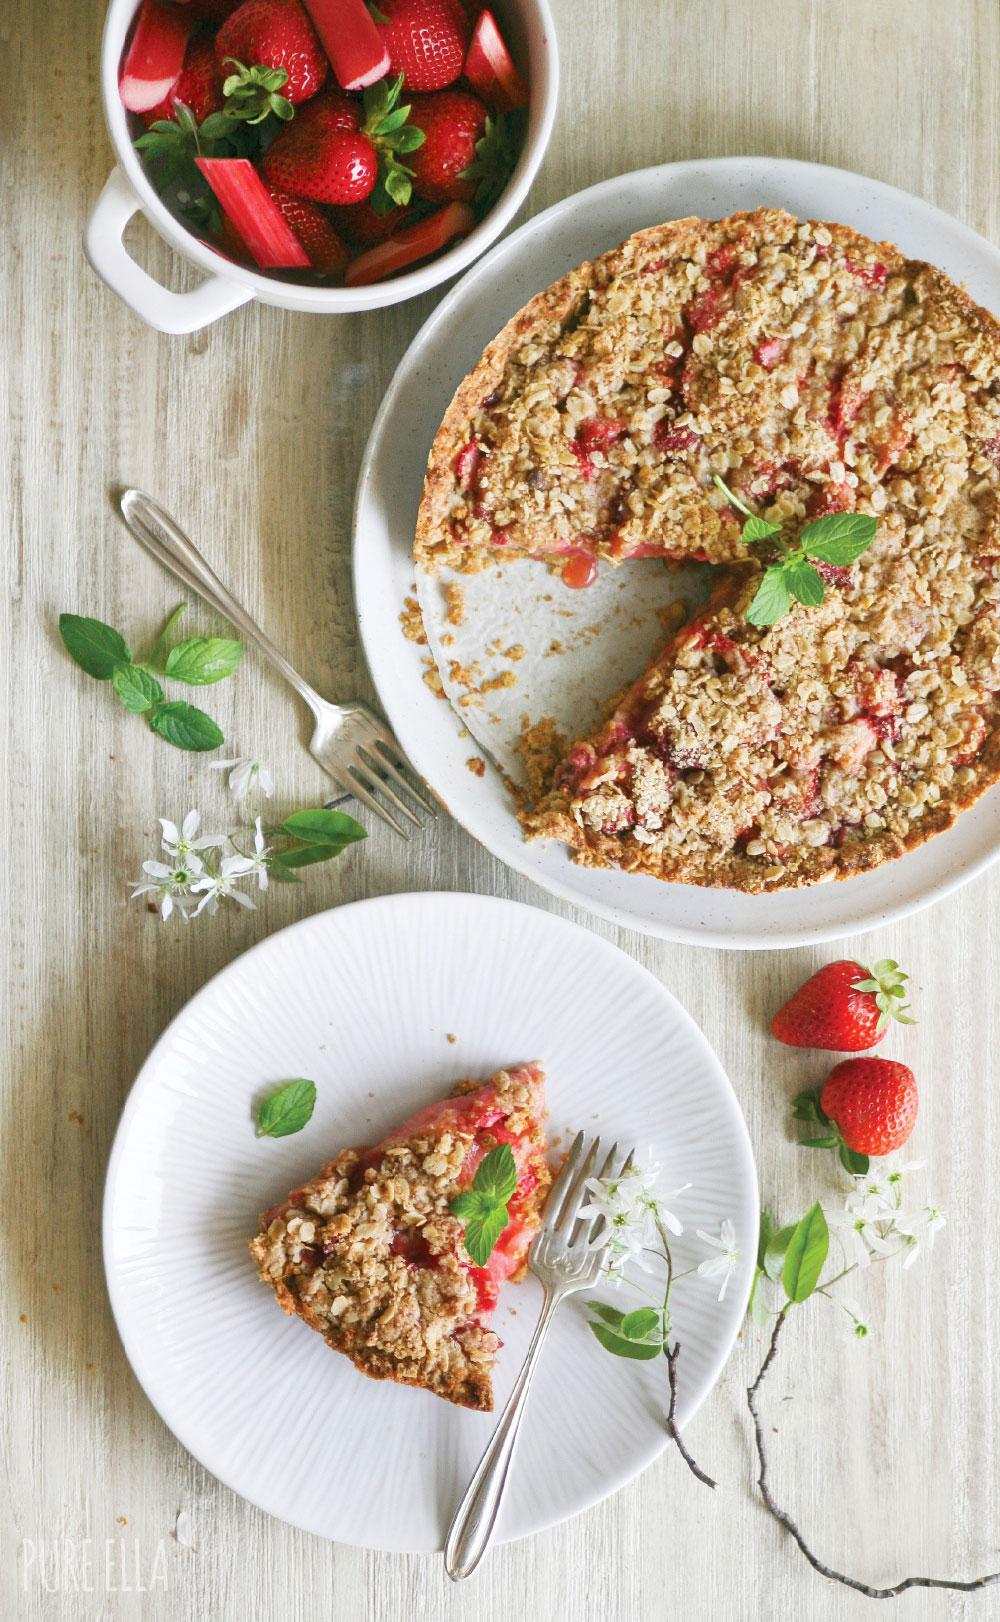 Pure-Ella-Gluten-free-vegan-Strawberry-Rhubarb-Crumble-Pie2